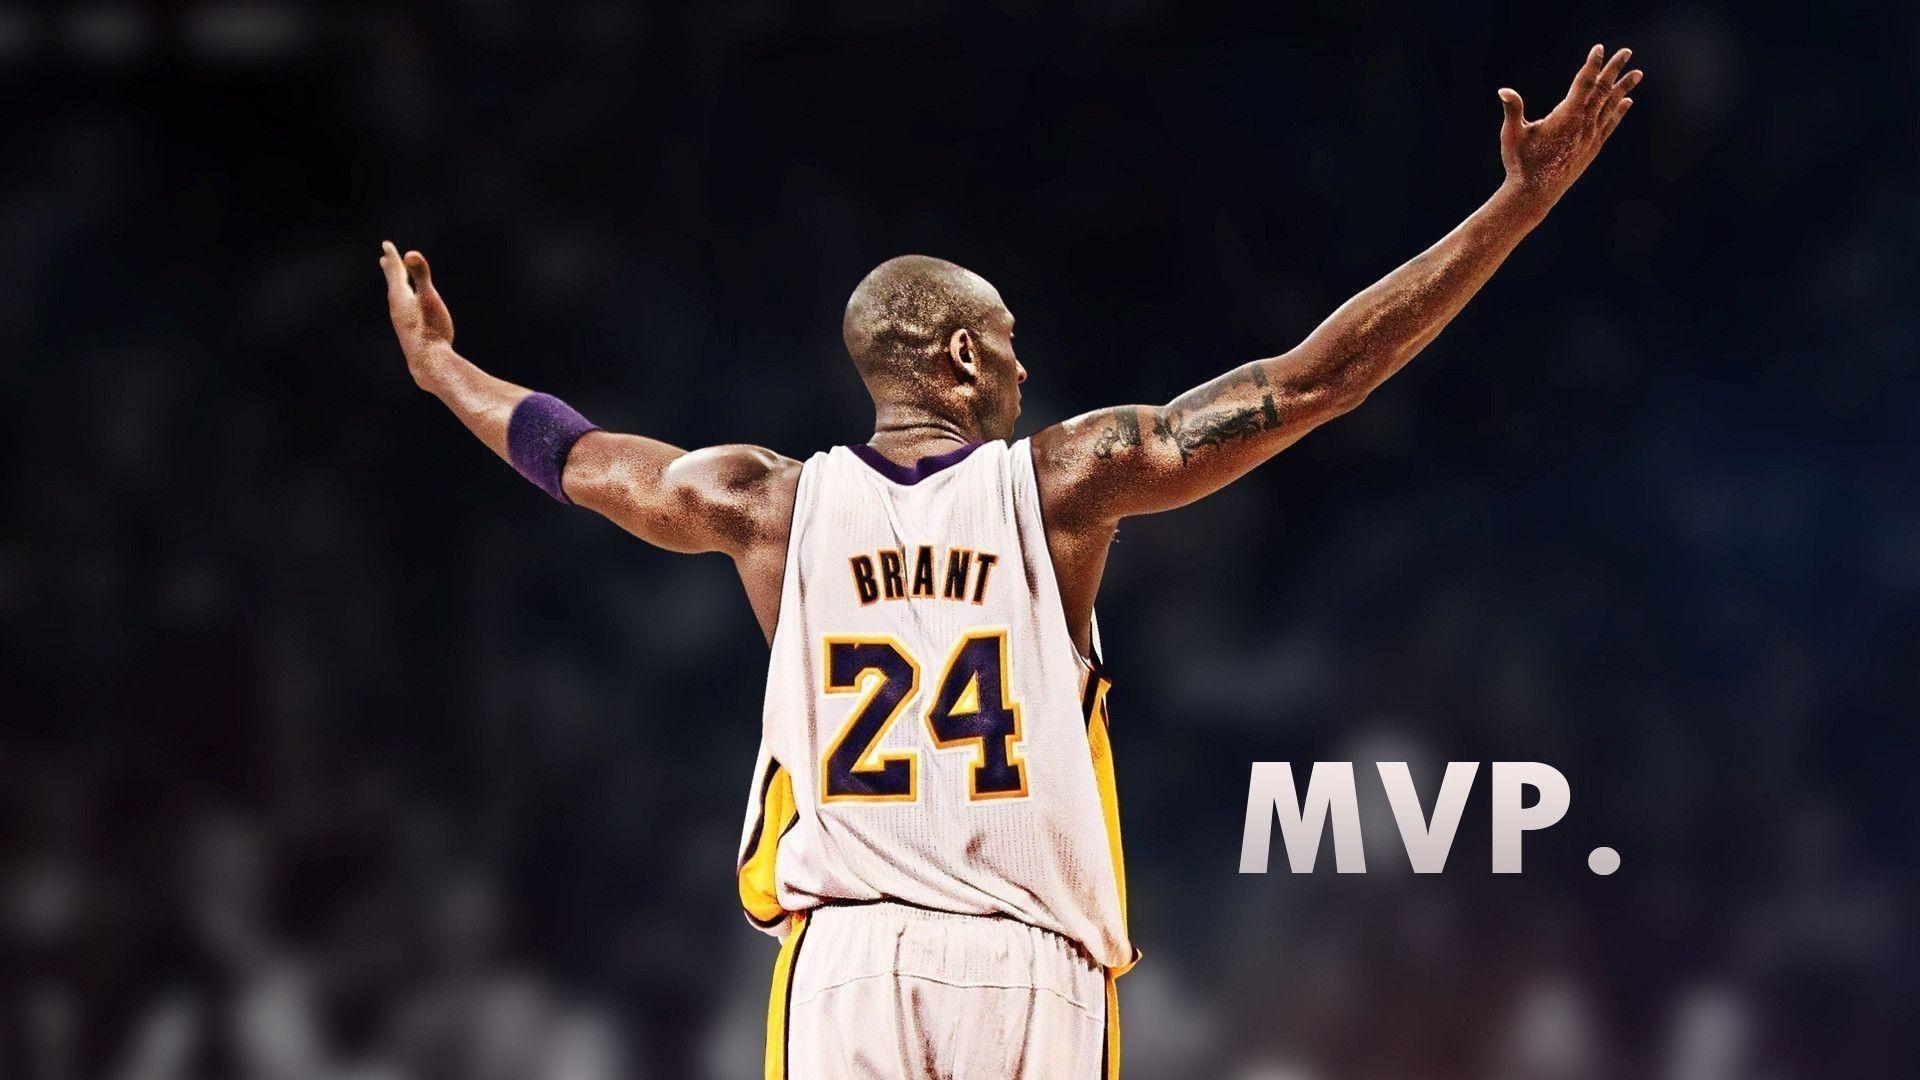 10 Top Kobe Bryant Wallpaper 1920x1080 Full Hd 1920 1080 For Pc Background Kobe Bryant Wallpaper Lakers Kobe Bryant Kobe Bryant Dunk